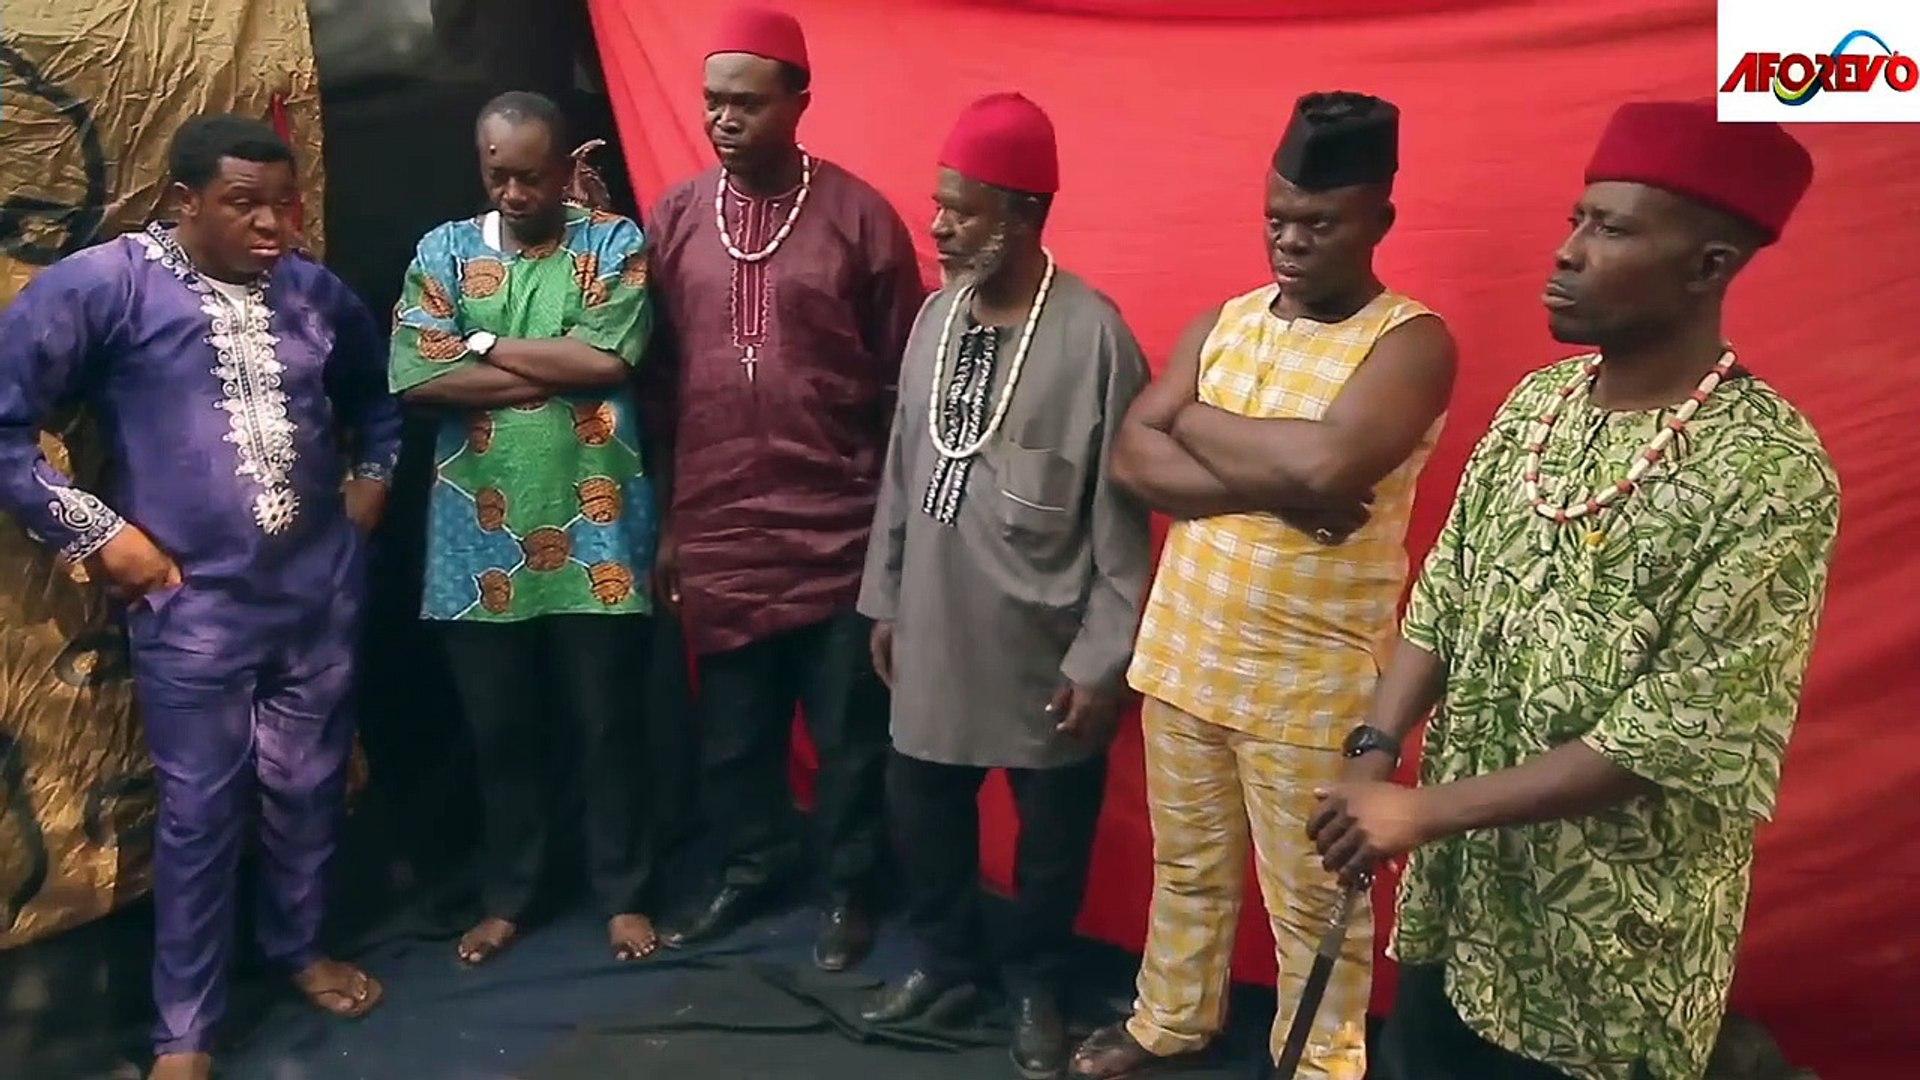 Chacha eke Best Movie That'LL Make U Cry Like A Baby 2-NIGERIAN MOVIES 2020|2020|AFRICAN MOVIES